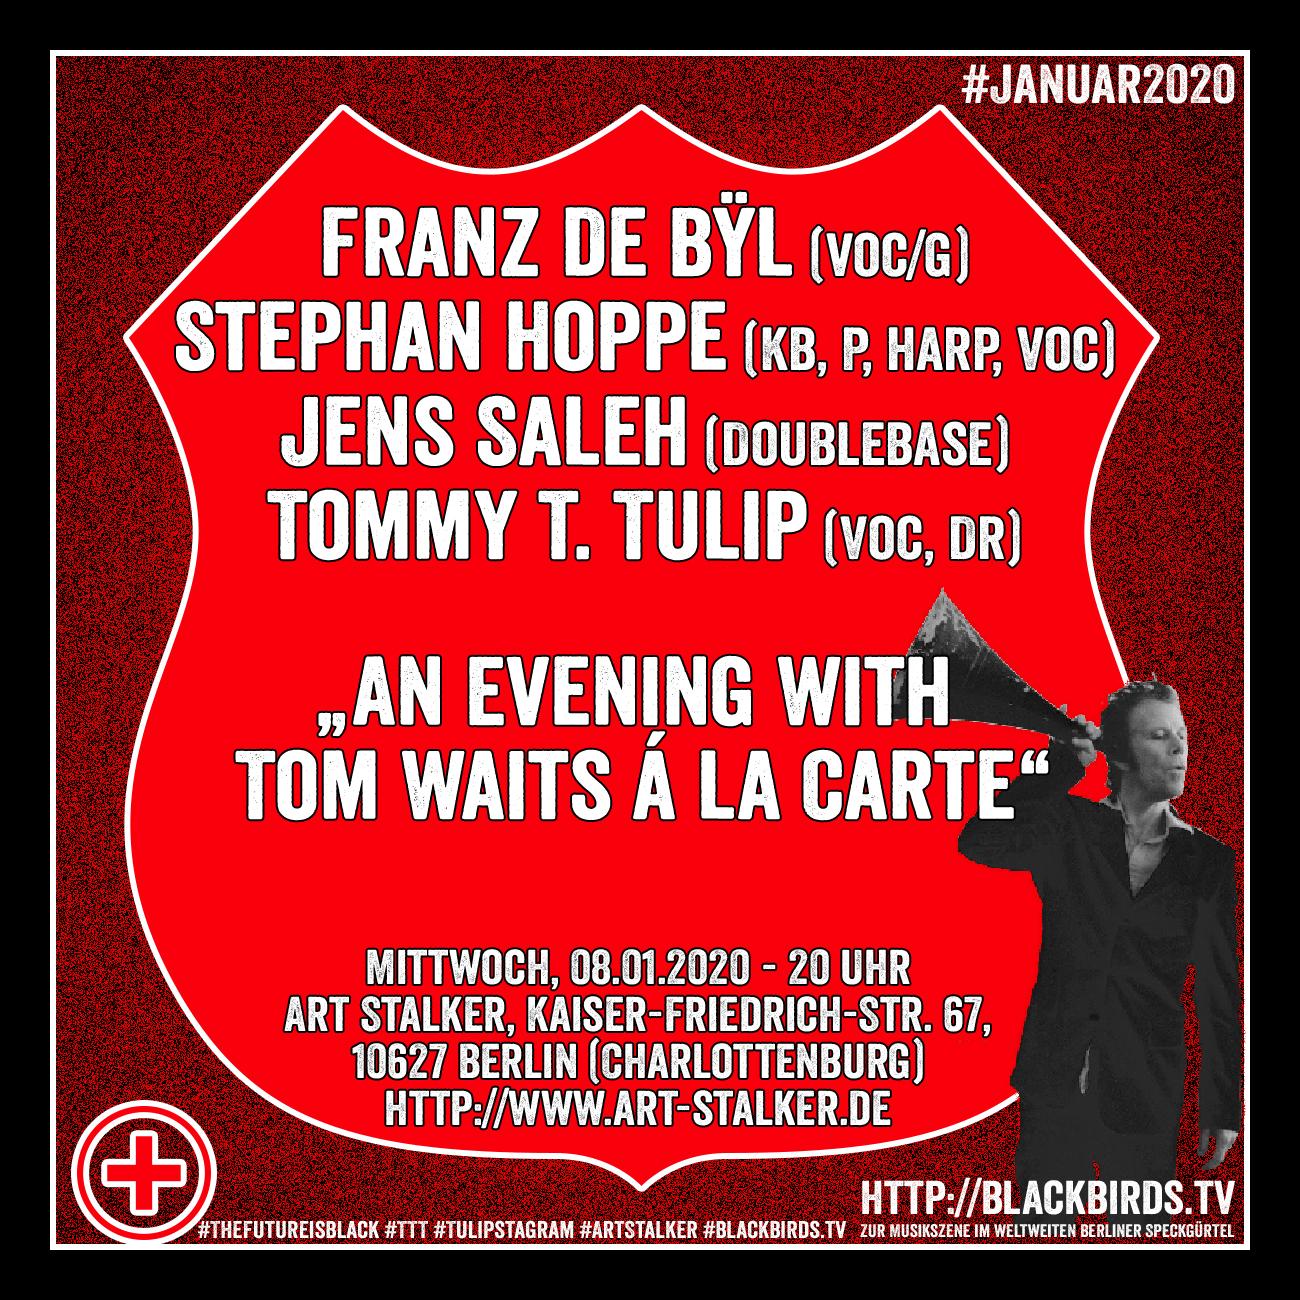 Gigpreview Am Mittwoch, 08.01.2020 um 20 Uhr: Franz de Bÿl & #Vinÿl "Tom Waits á la carte" im #ArtStalker